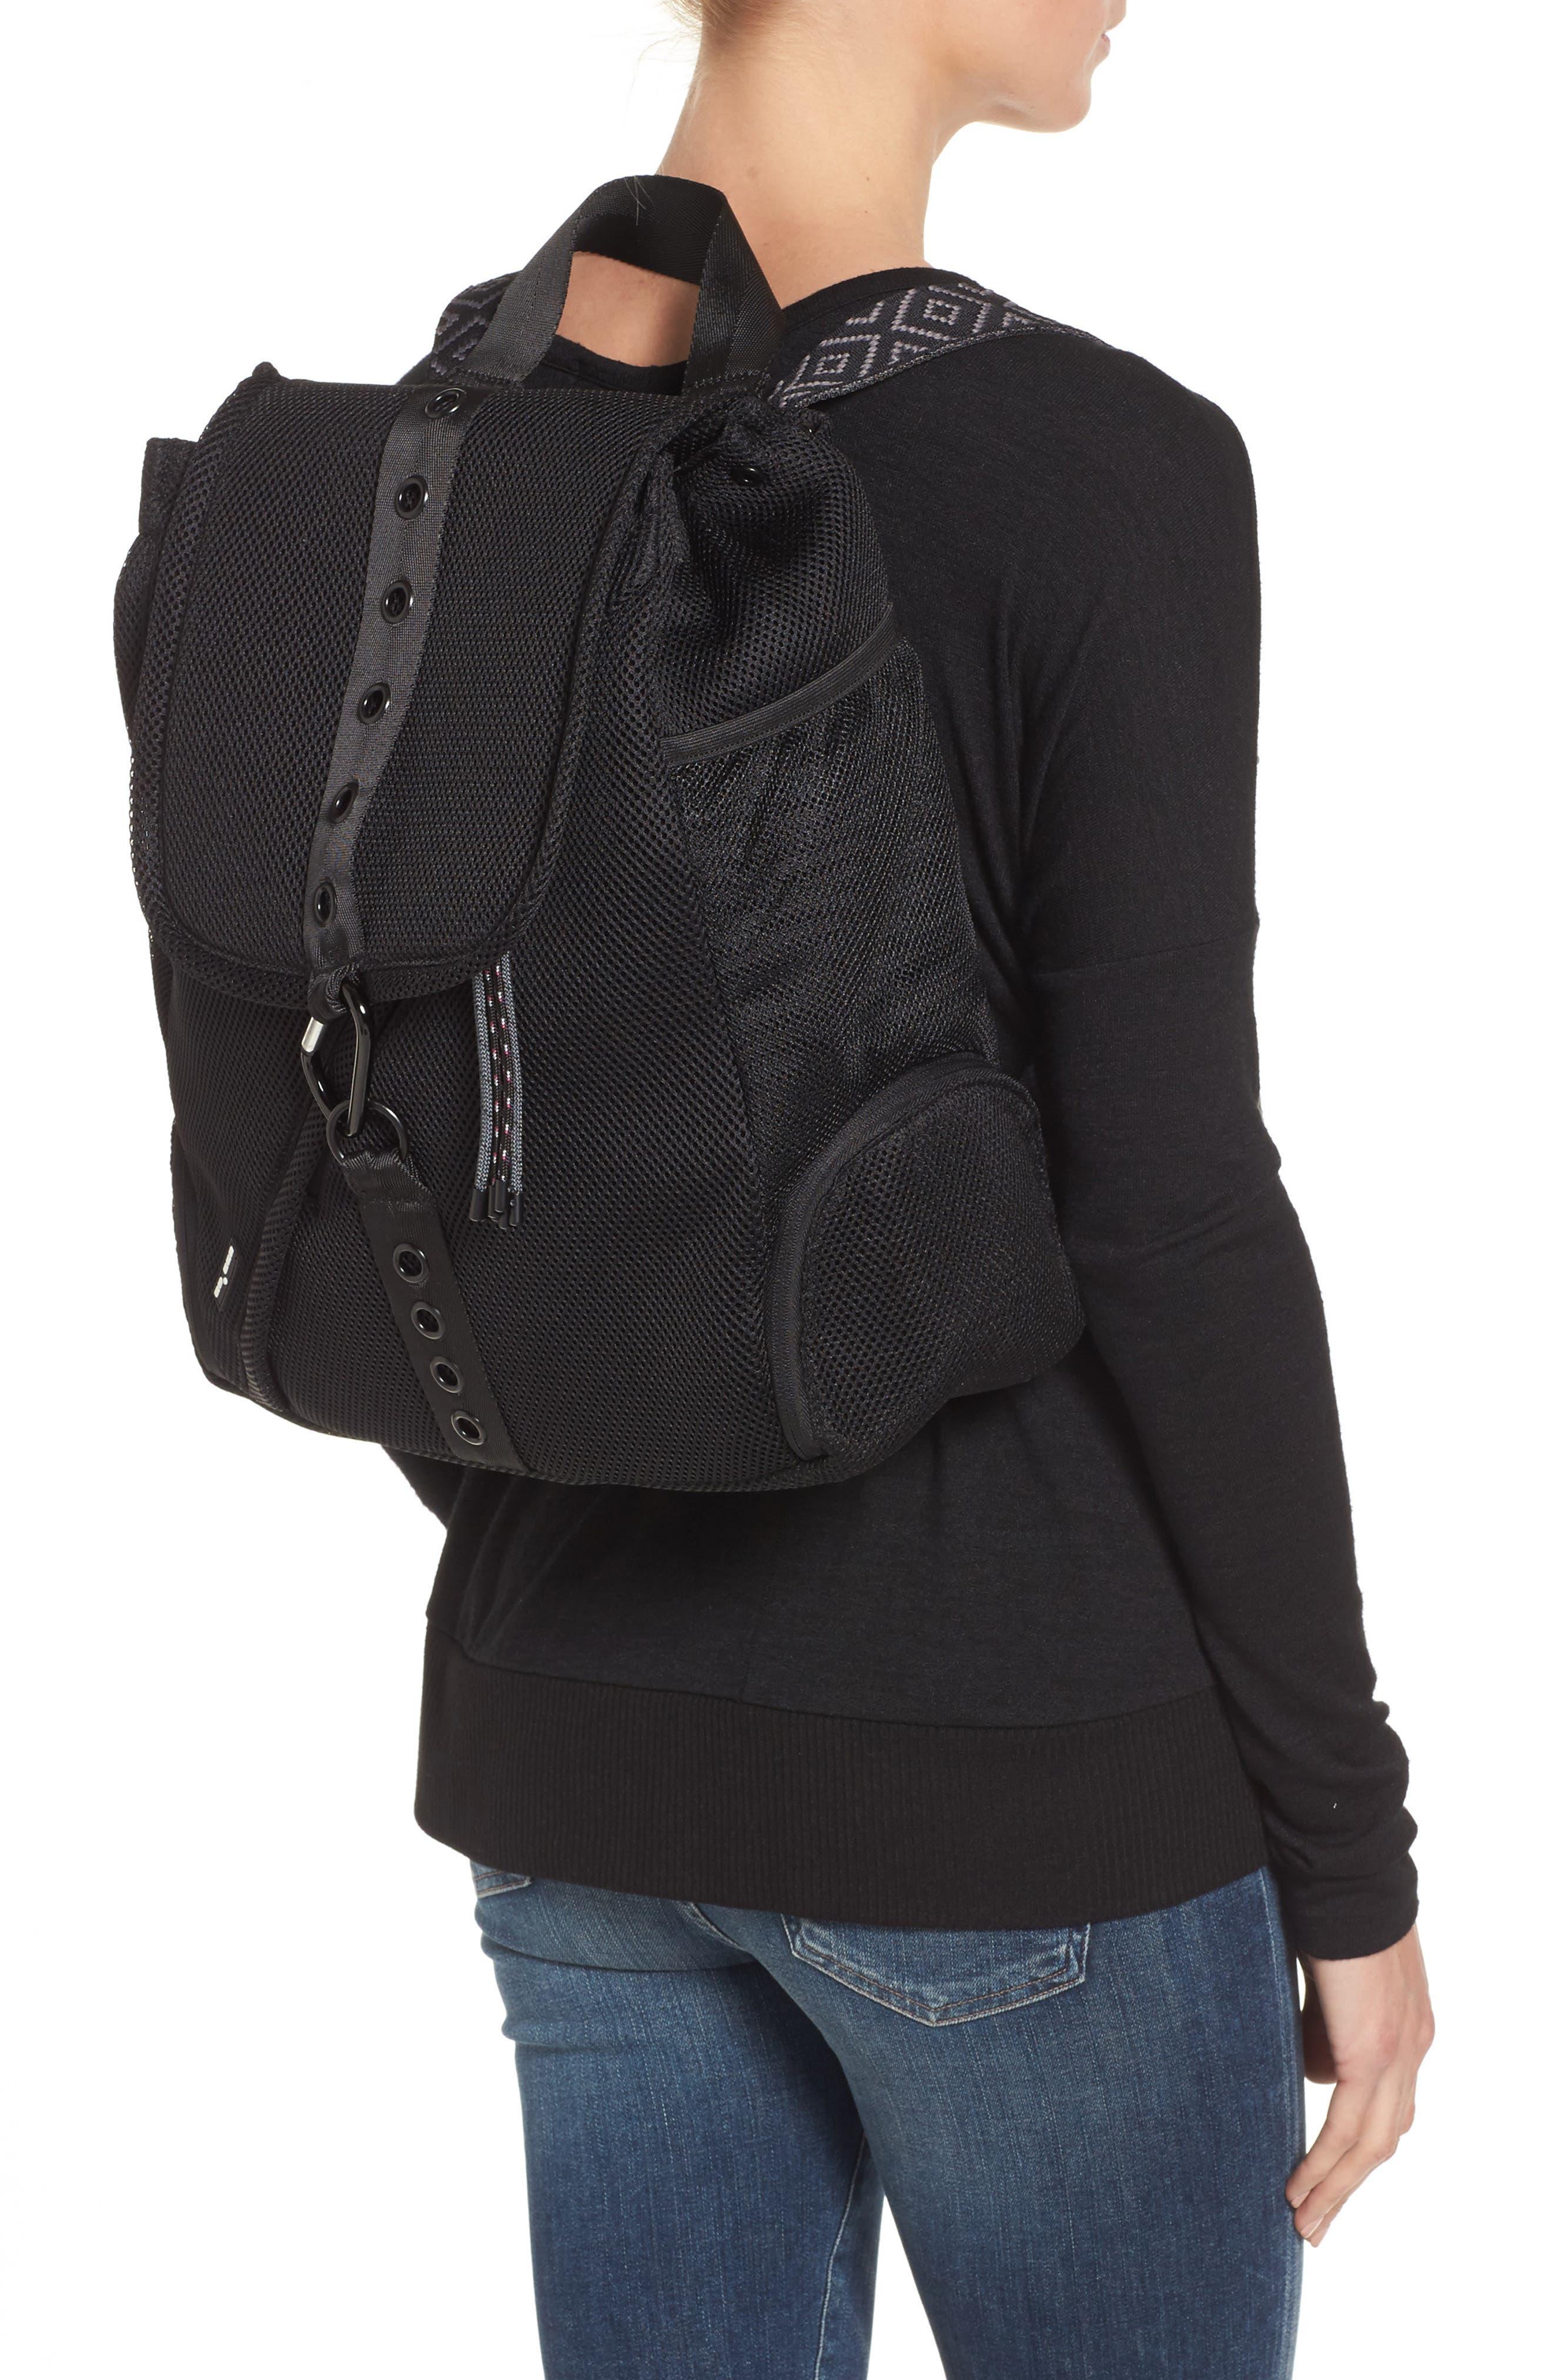 Water Resistant Backpack,                             Alternate thumbnail 2, color,                             001